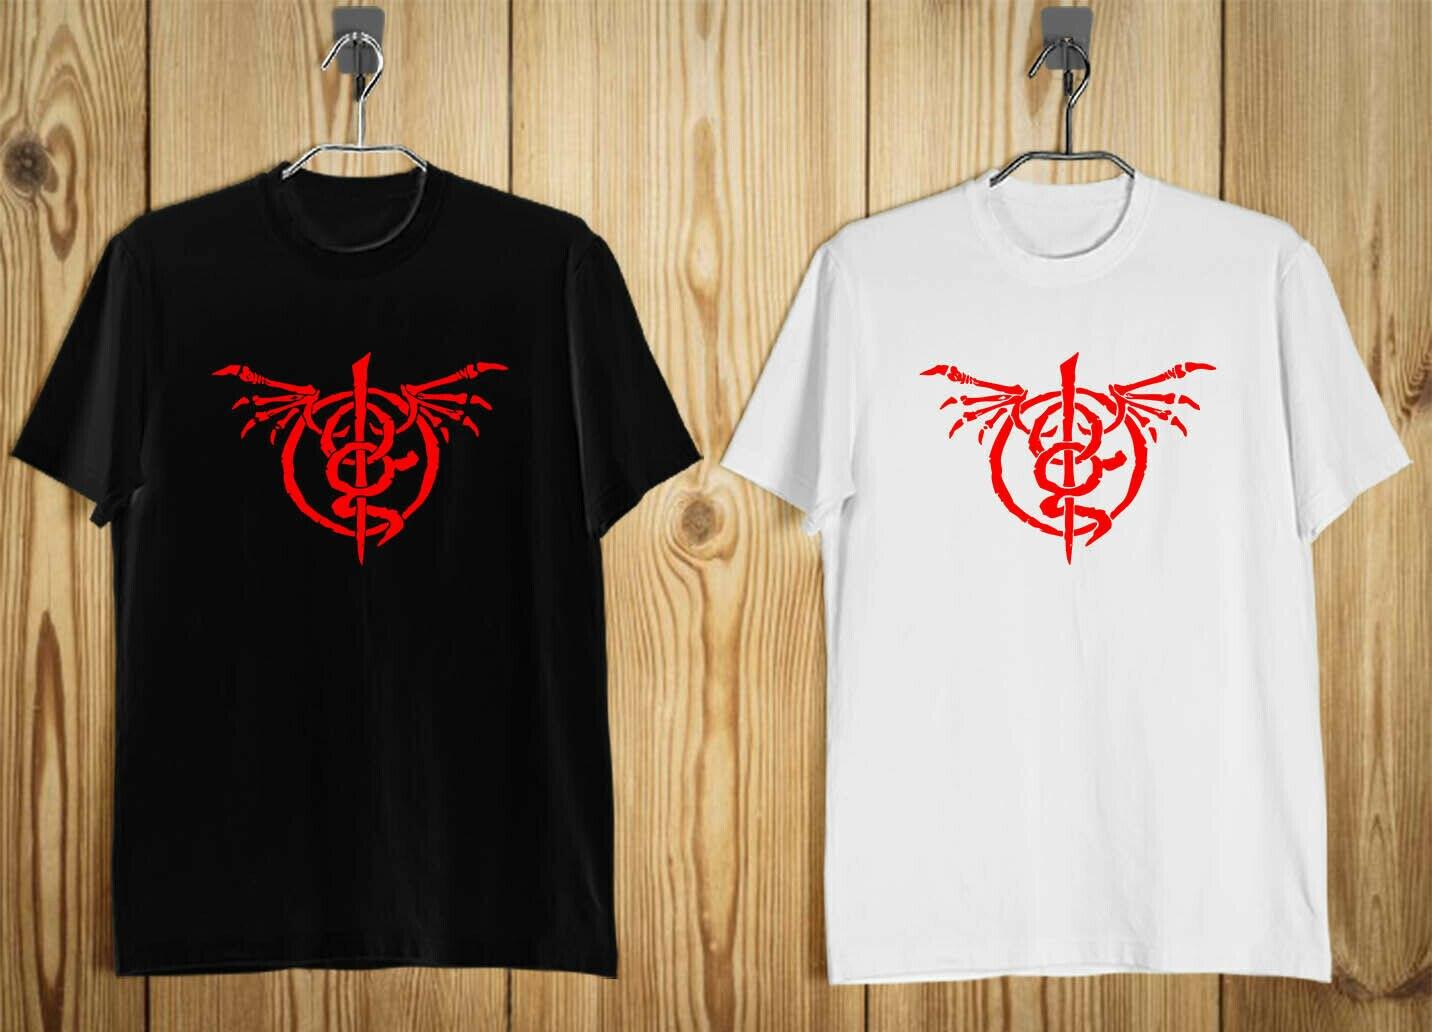 New Lamb of God Wrath Album American Metal Band Men's T-Shirt Black White S-3XL